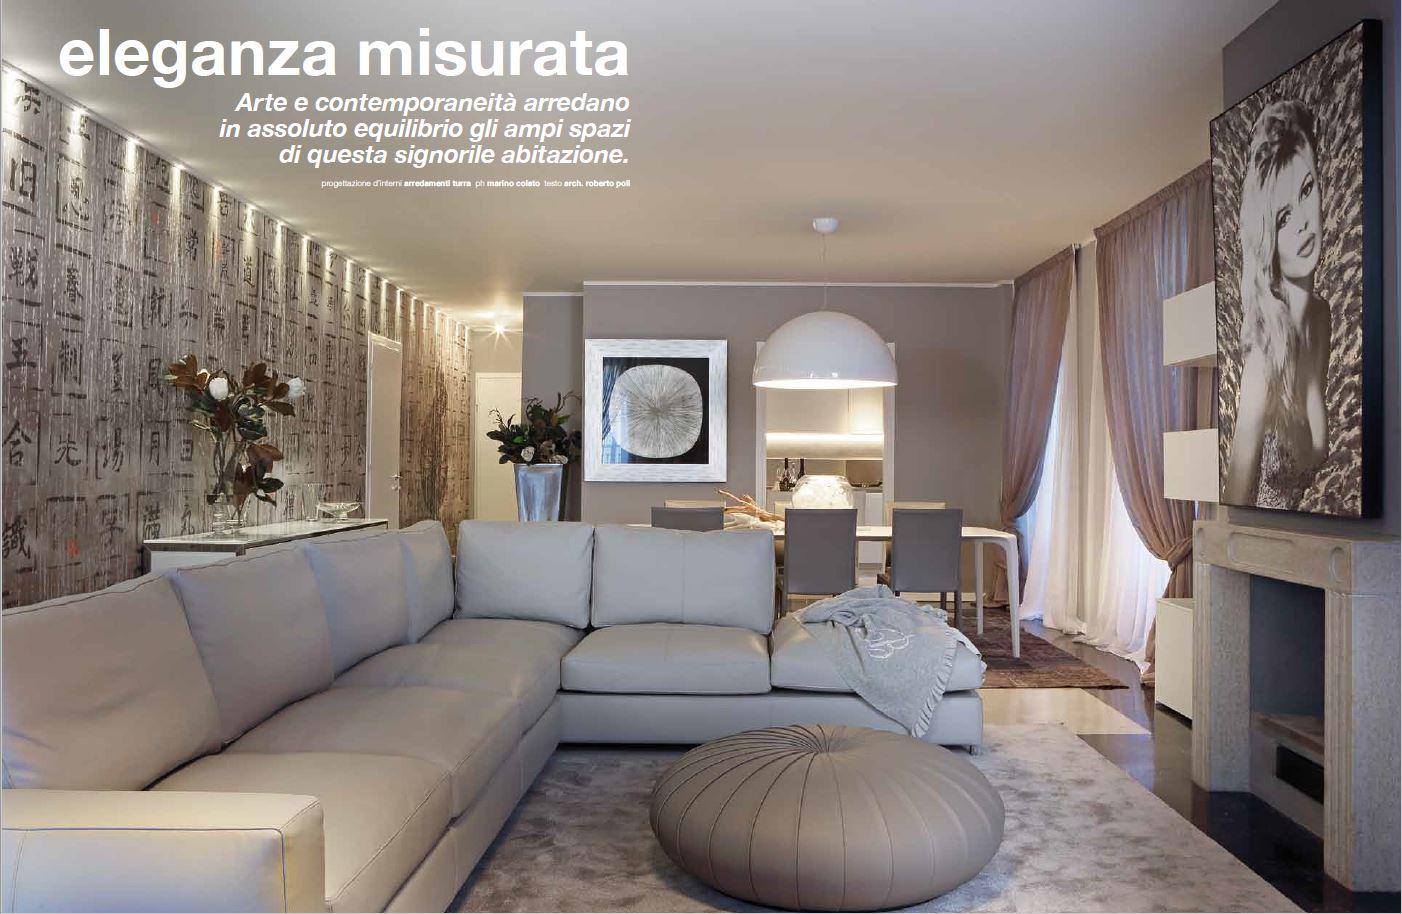 Eleganza misurata interior designer turra cristian turra for Turra arredamenti